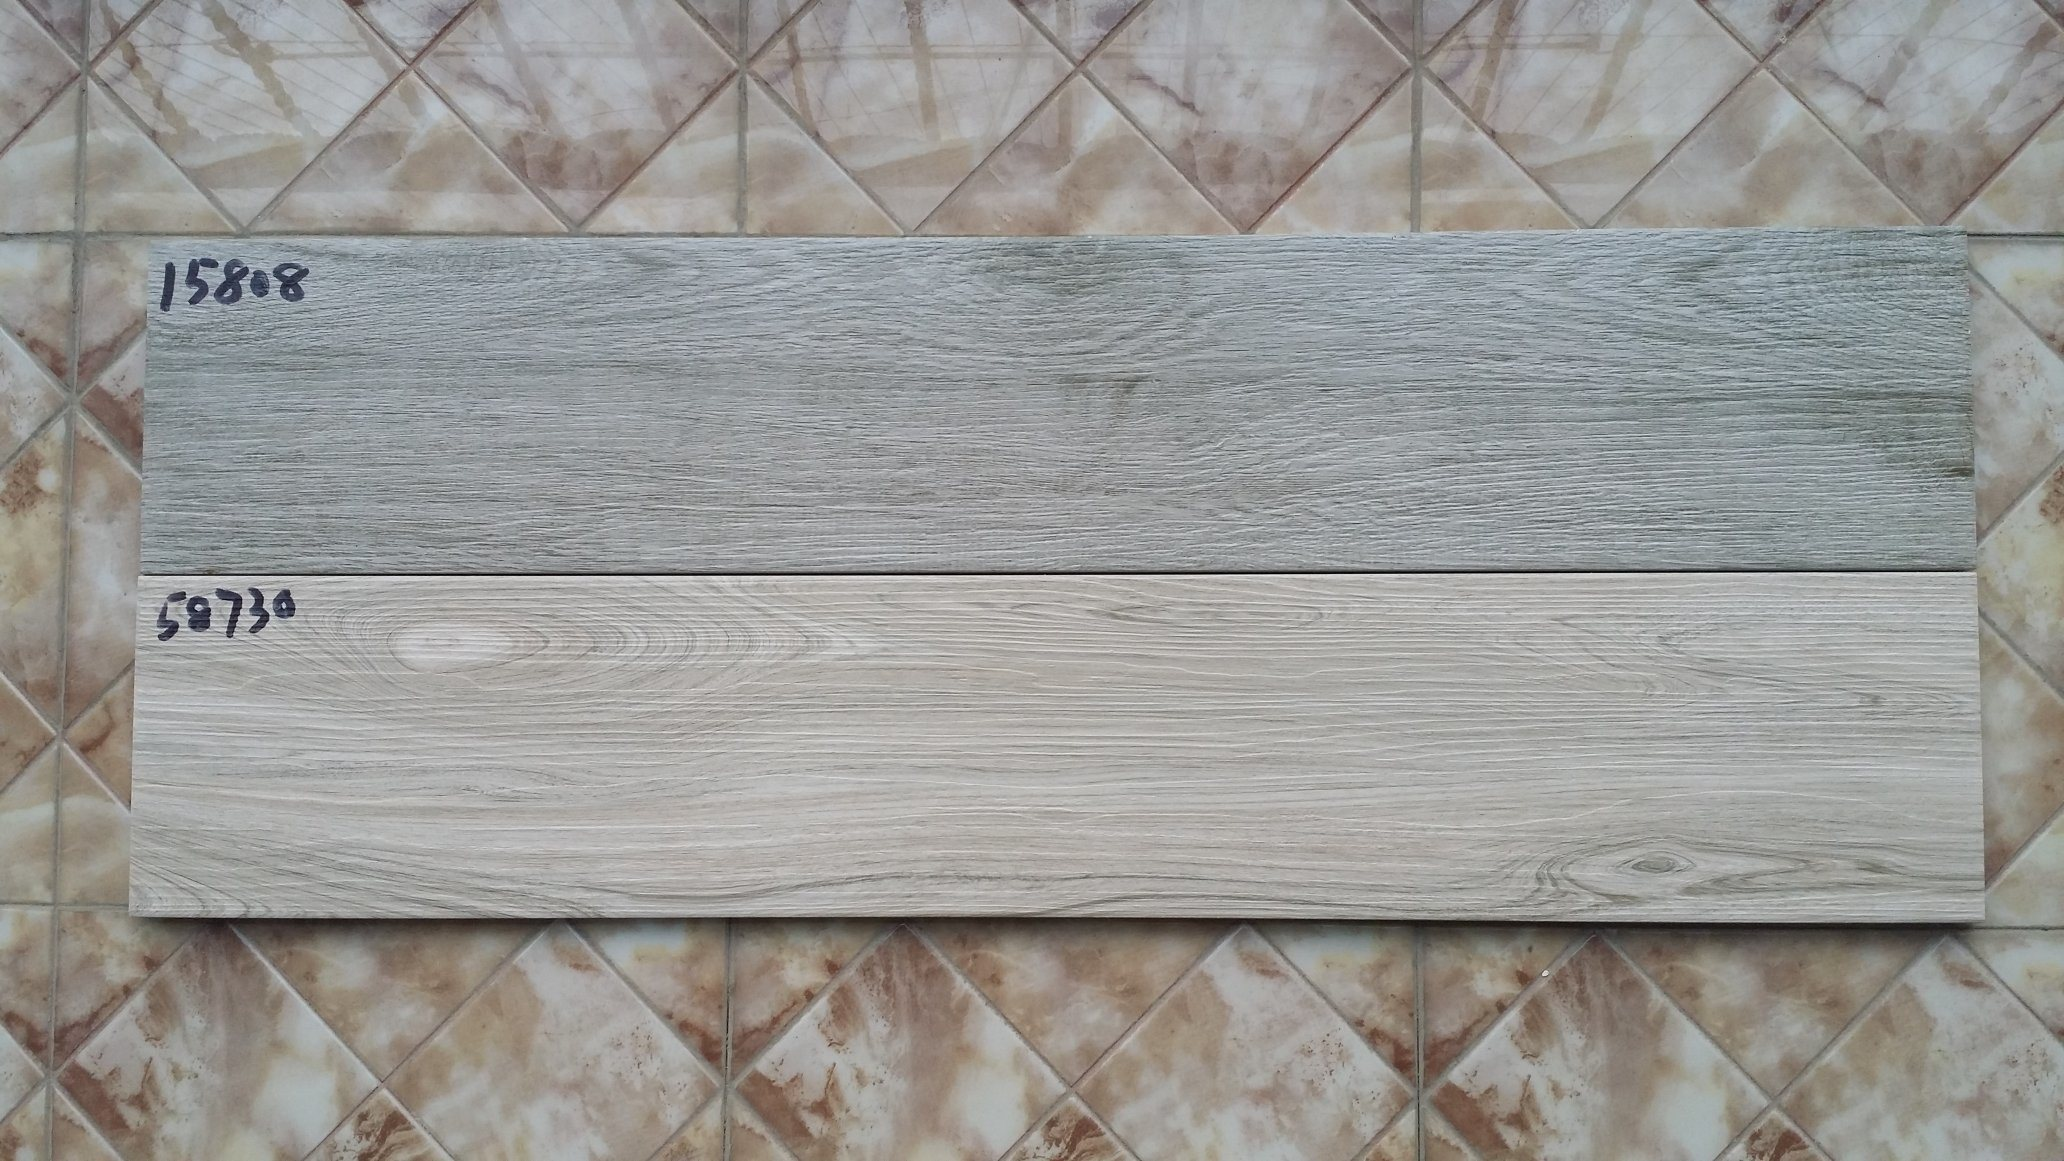 design interior ideas after plank remodel tile floors planks wood kitchen floor look in grain porcelain